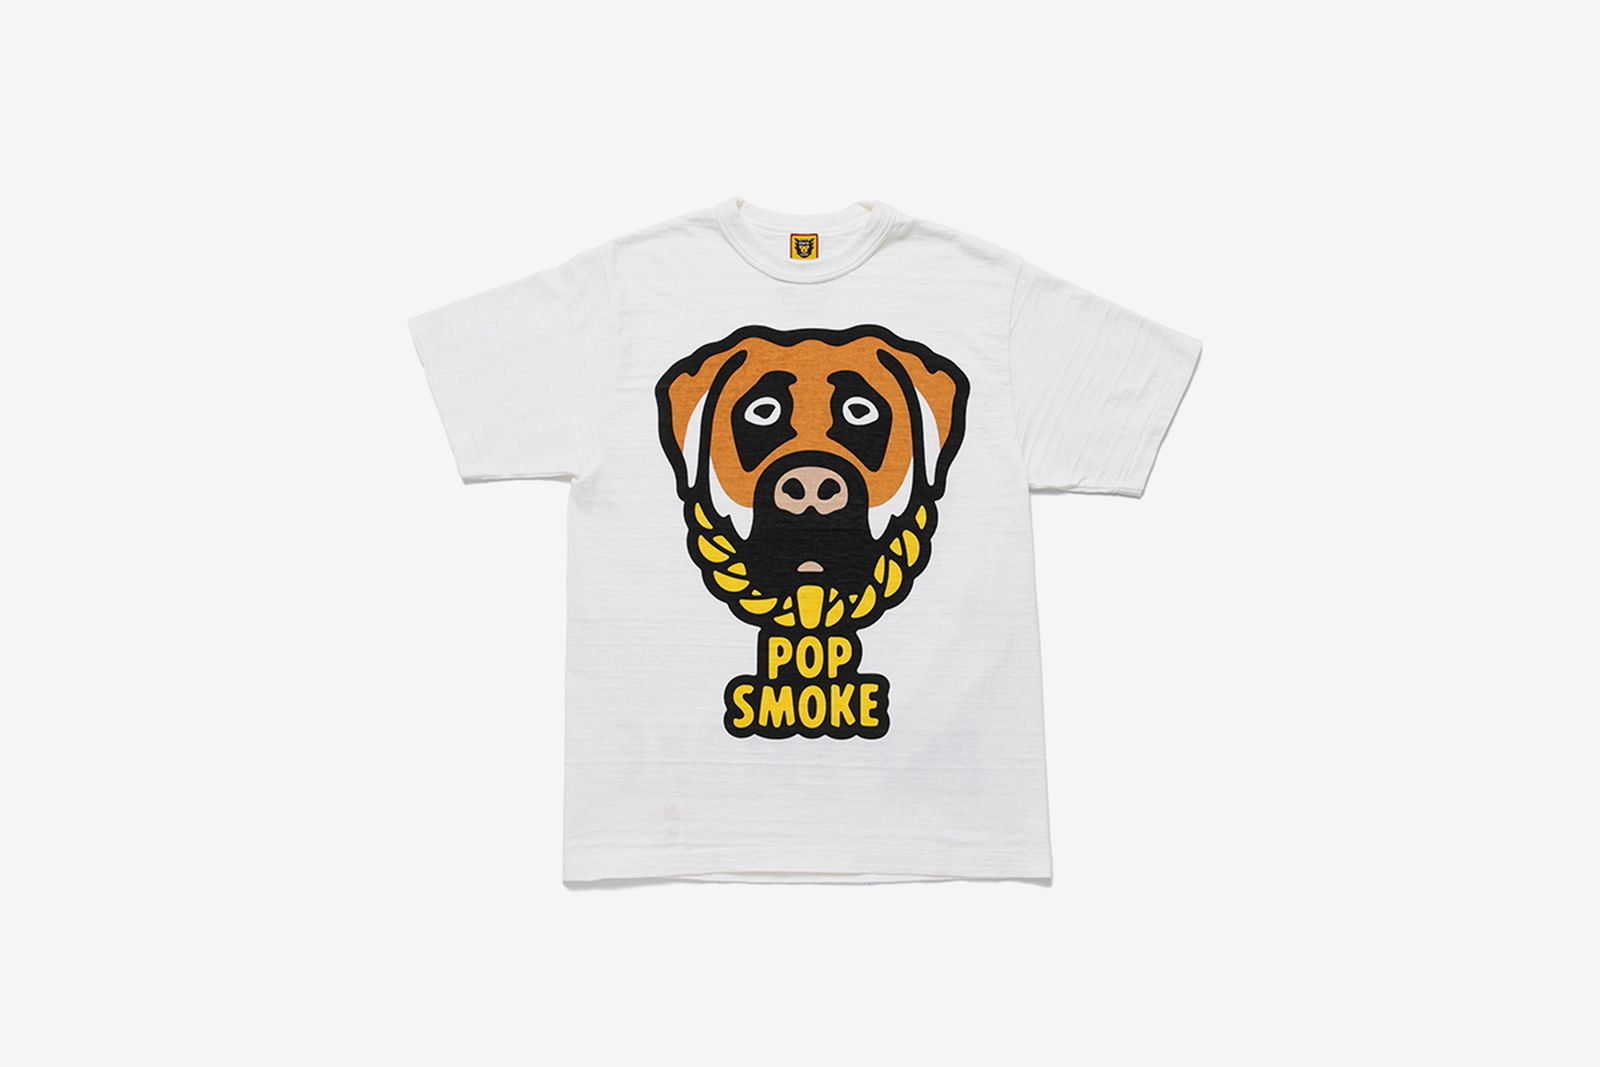 Human Made Pop Smoke T-shirt